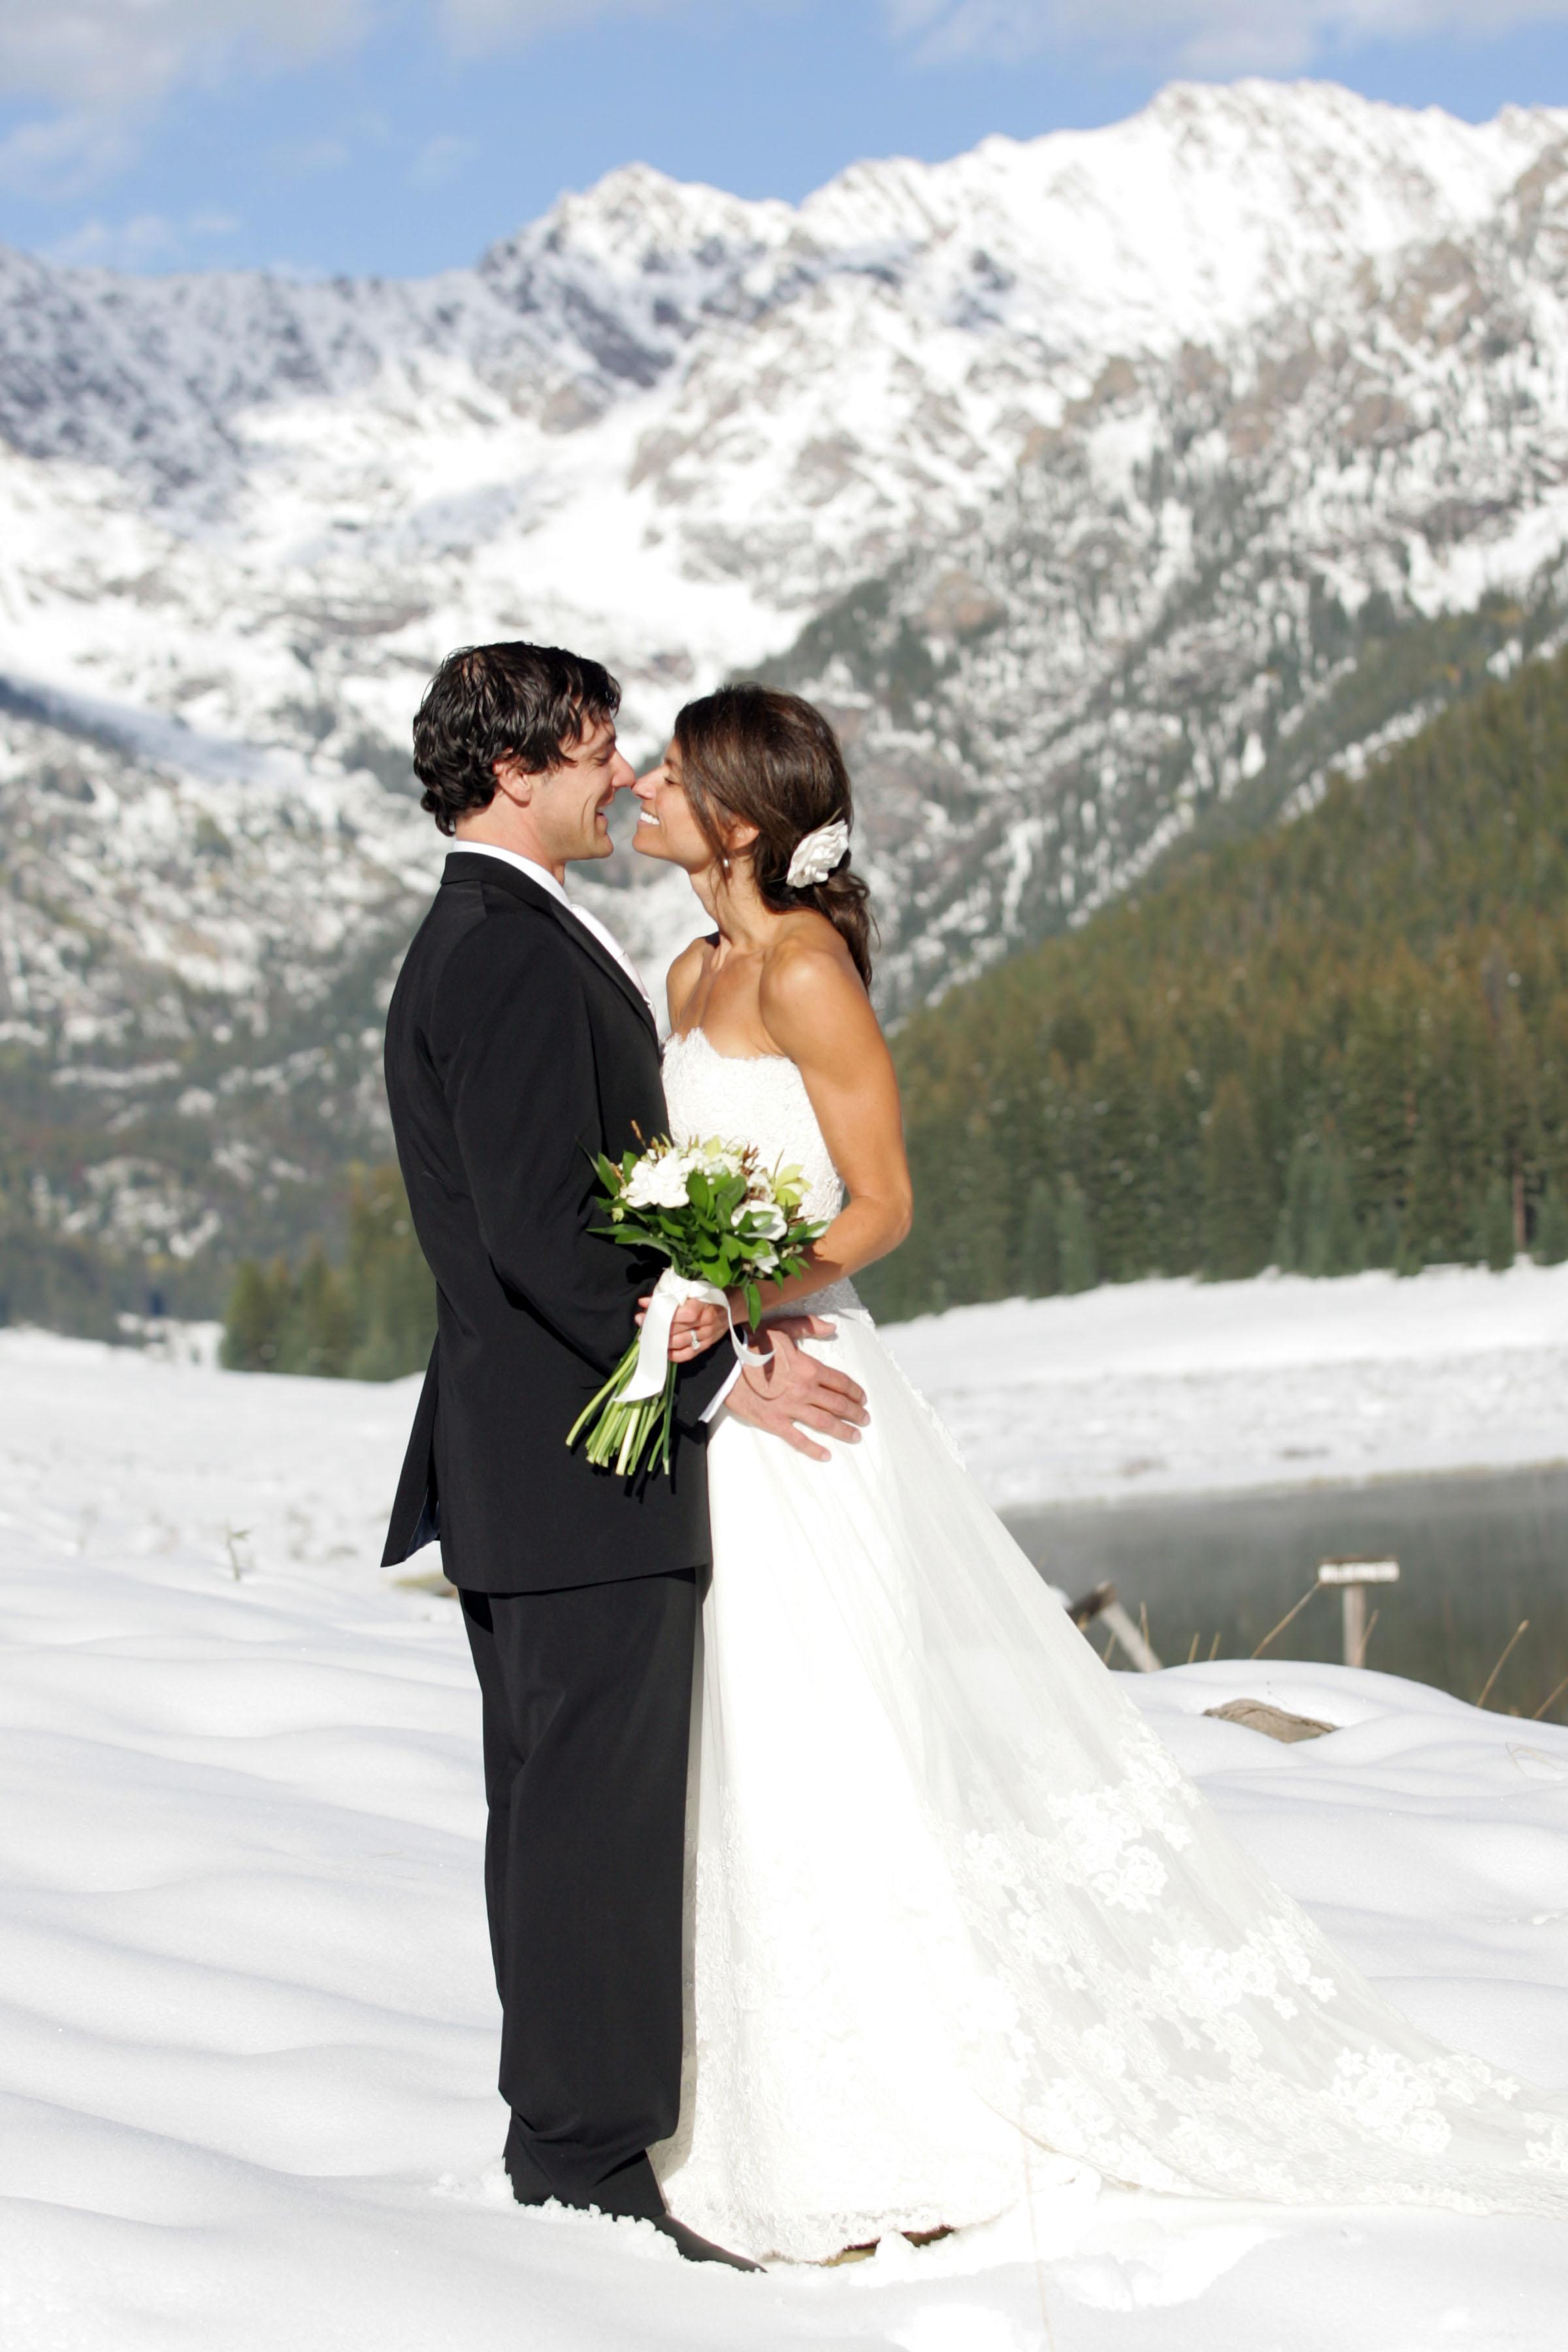 Wedding Photography at Piney River Ranch